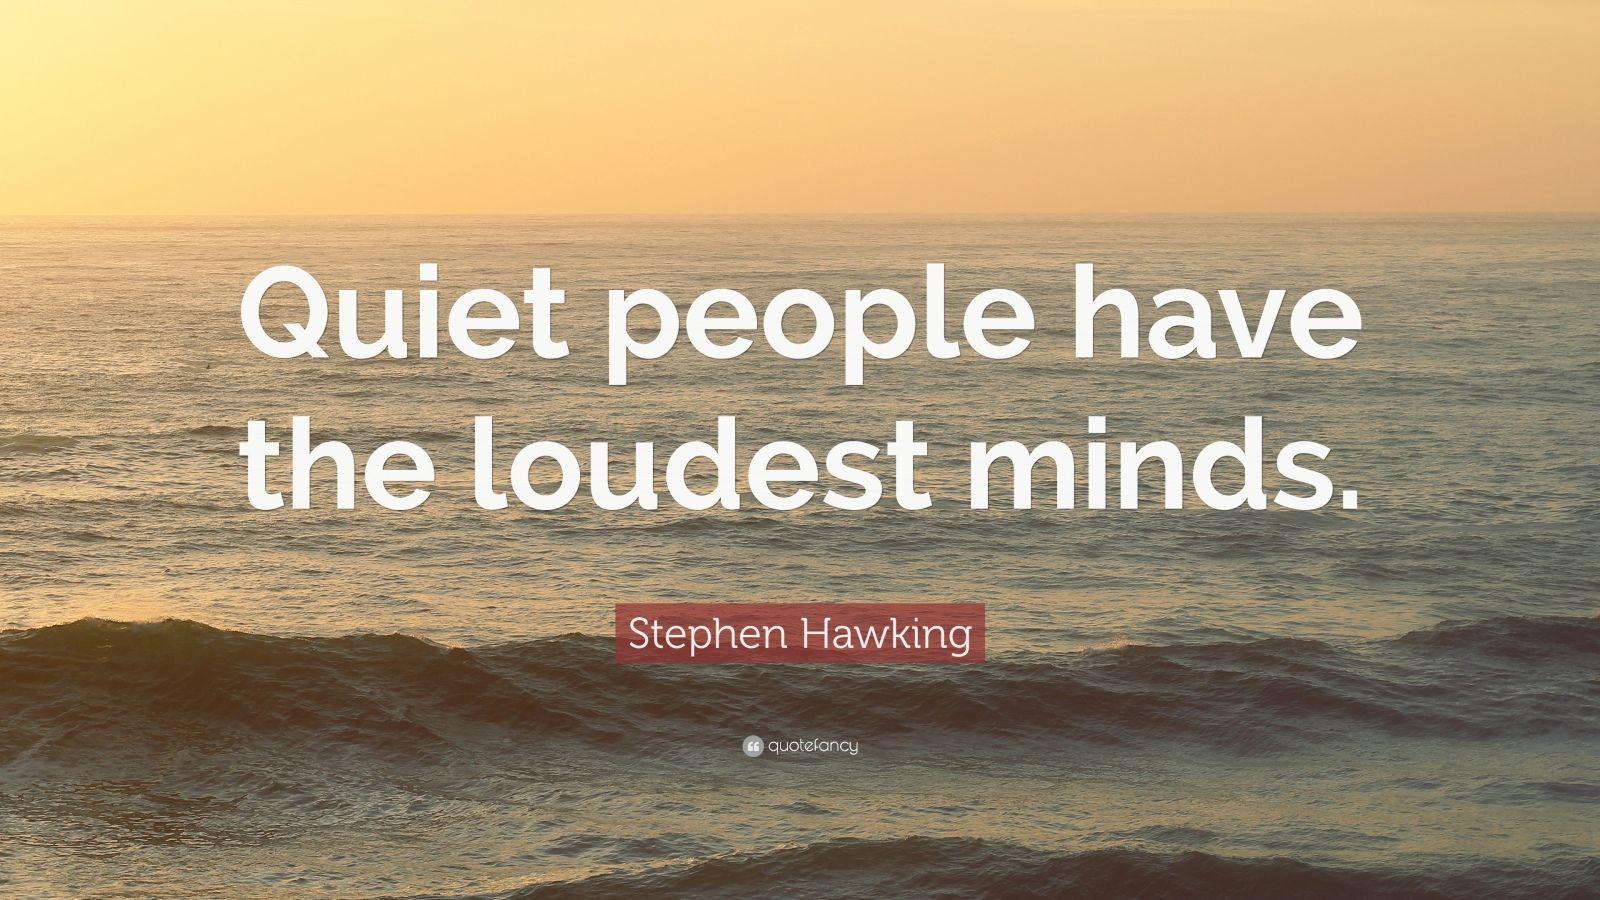 Jane Austen Quotes Wallpaper Stephen Hawking Quote Quiet People Have The Loudest